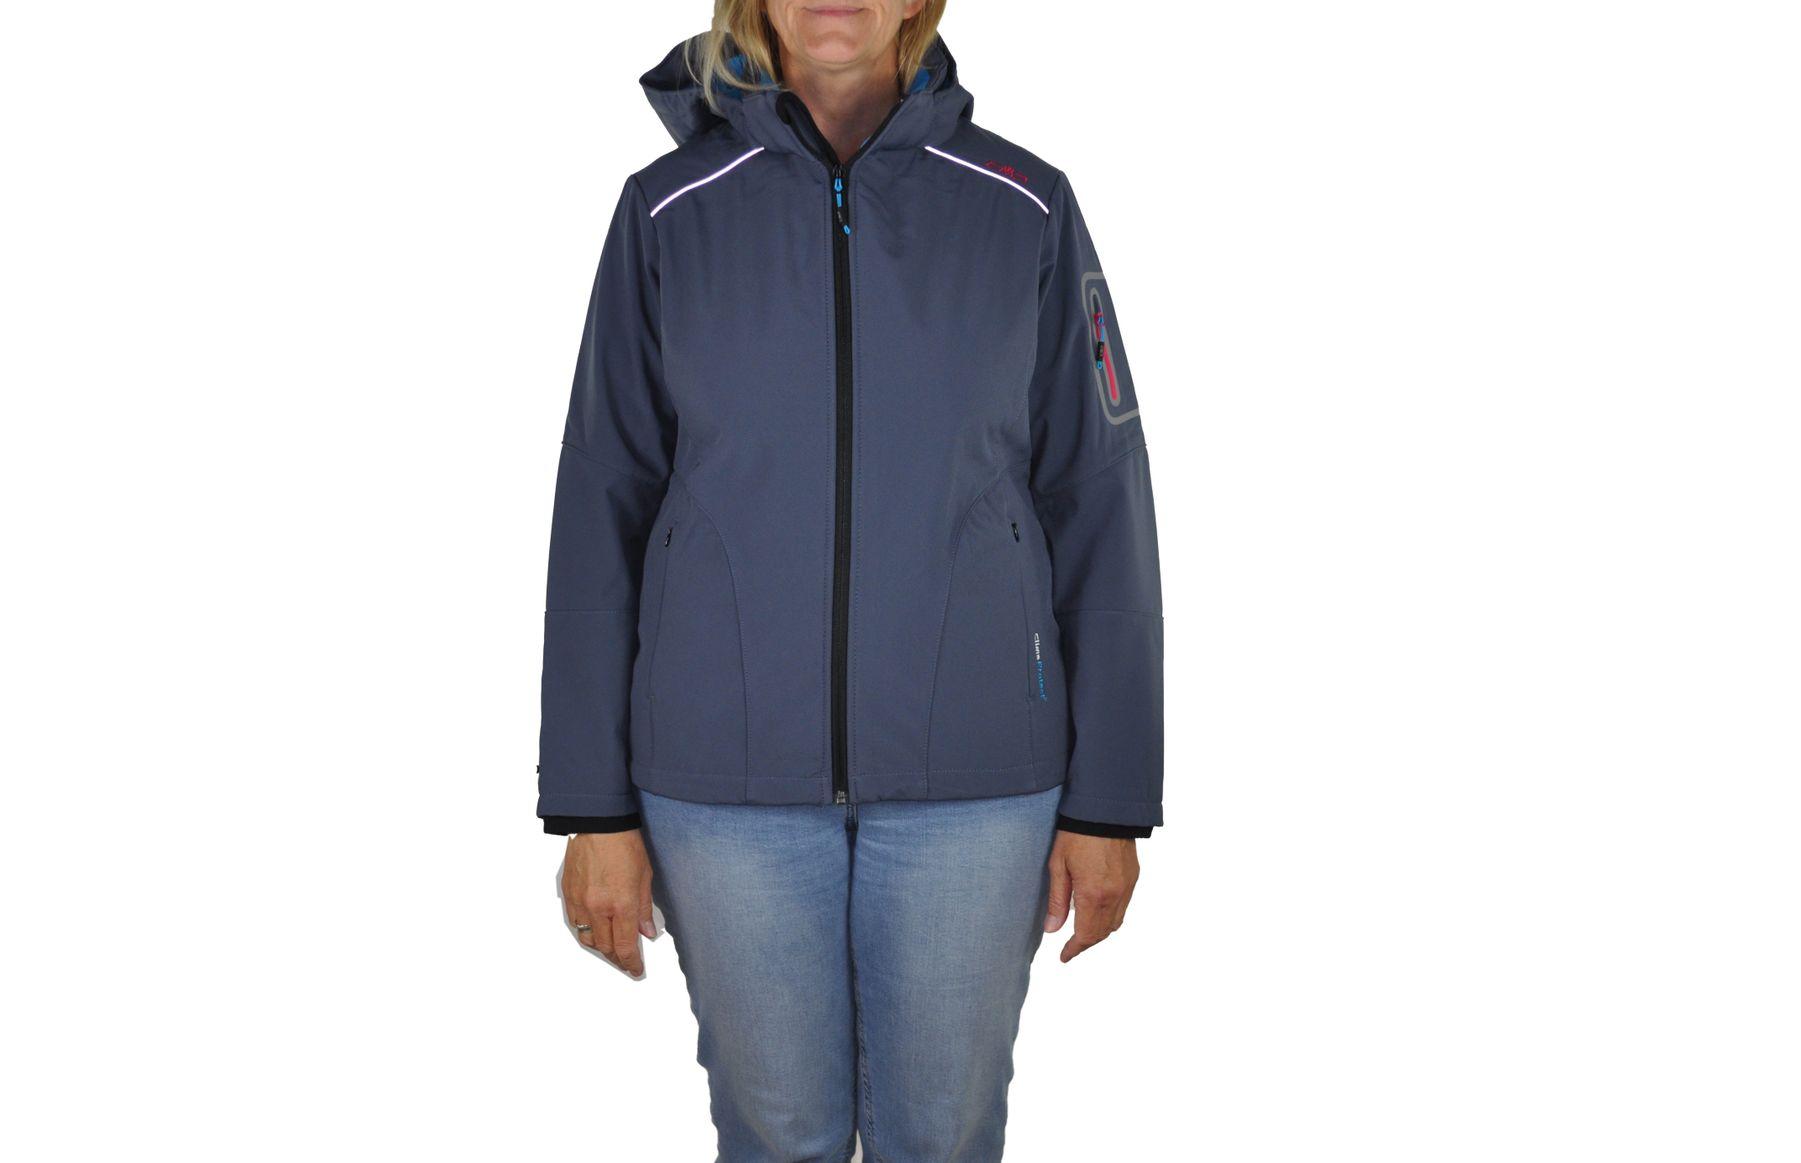 CMP - Damen Softshell Jacke, Winddicht, Wasserdicht, Atmungsaktiv (3A05396) – Bild 7